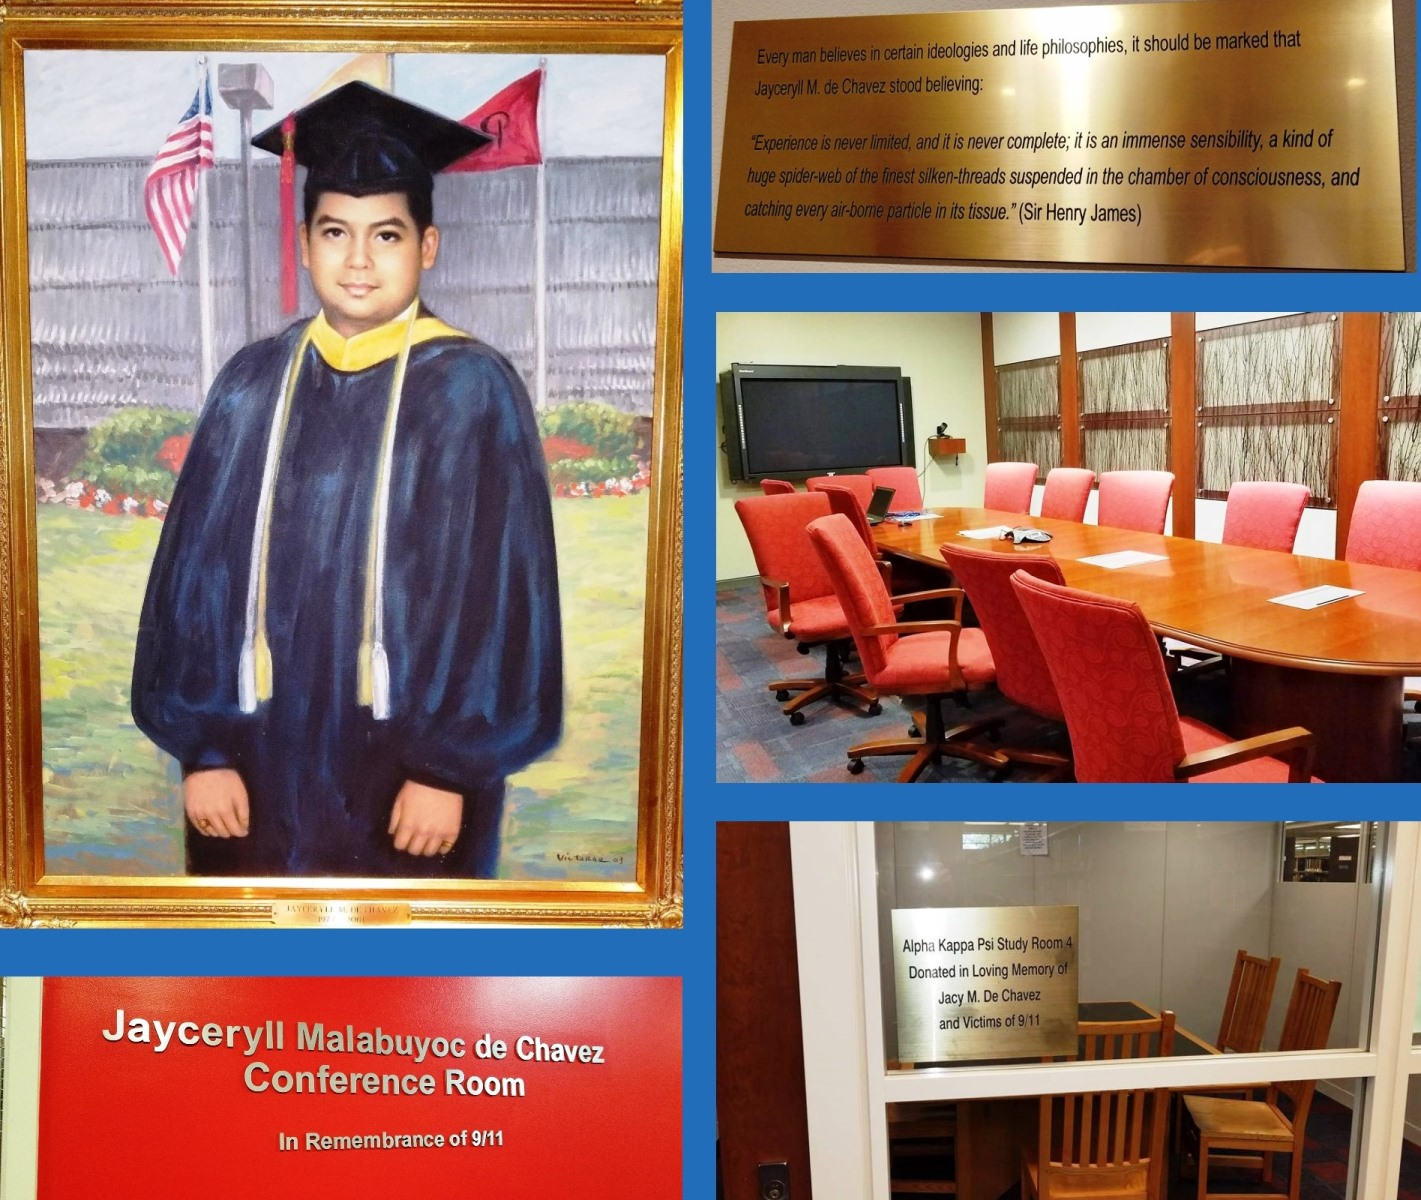 Jaceryll Malabuyoc de Chavez - Tributes at Carr Library